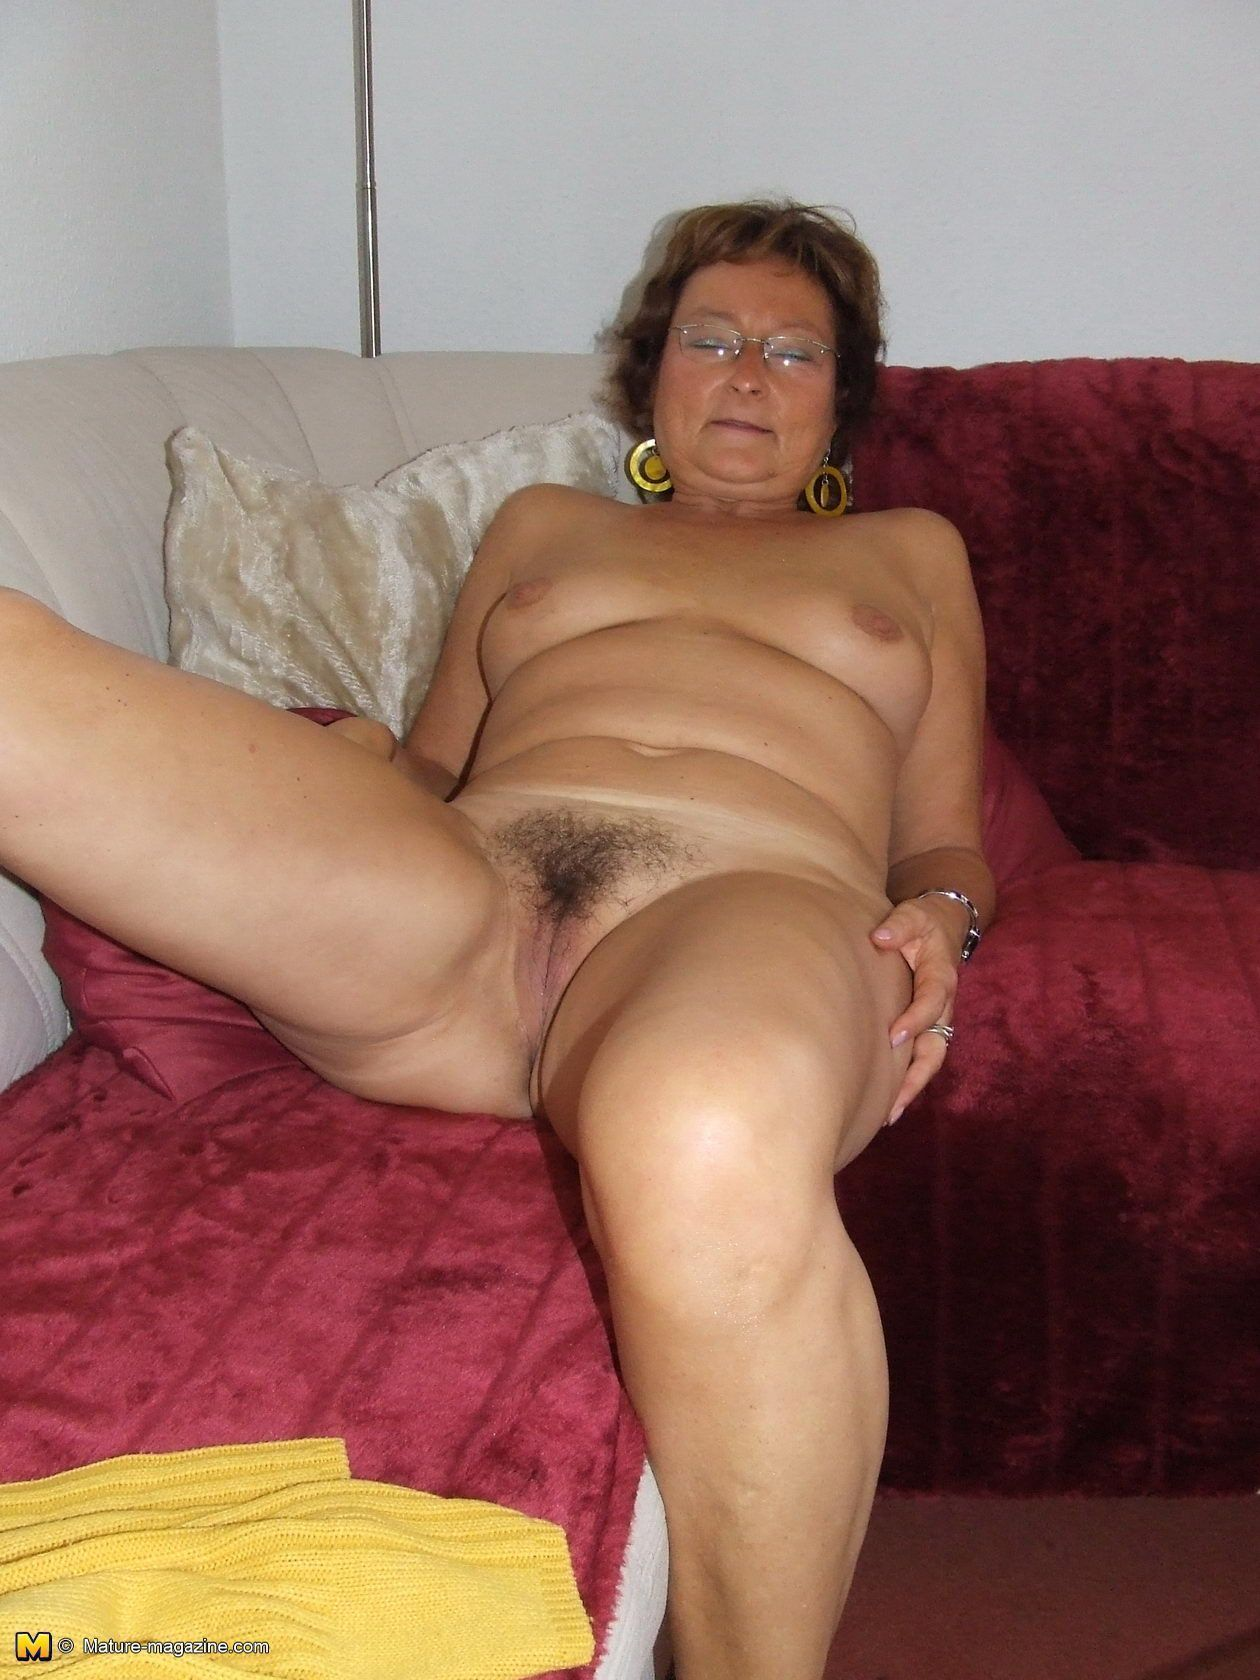 Free nude housewife photos